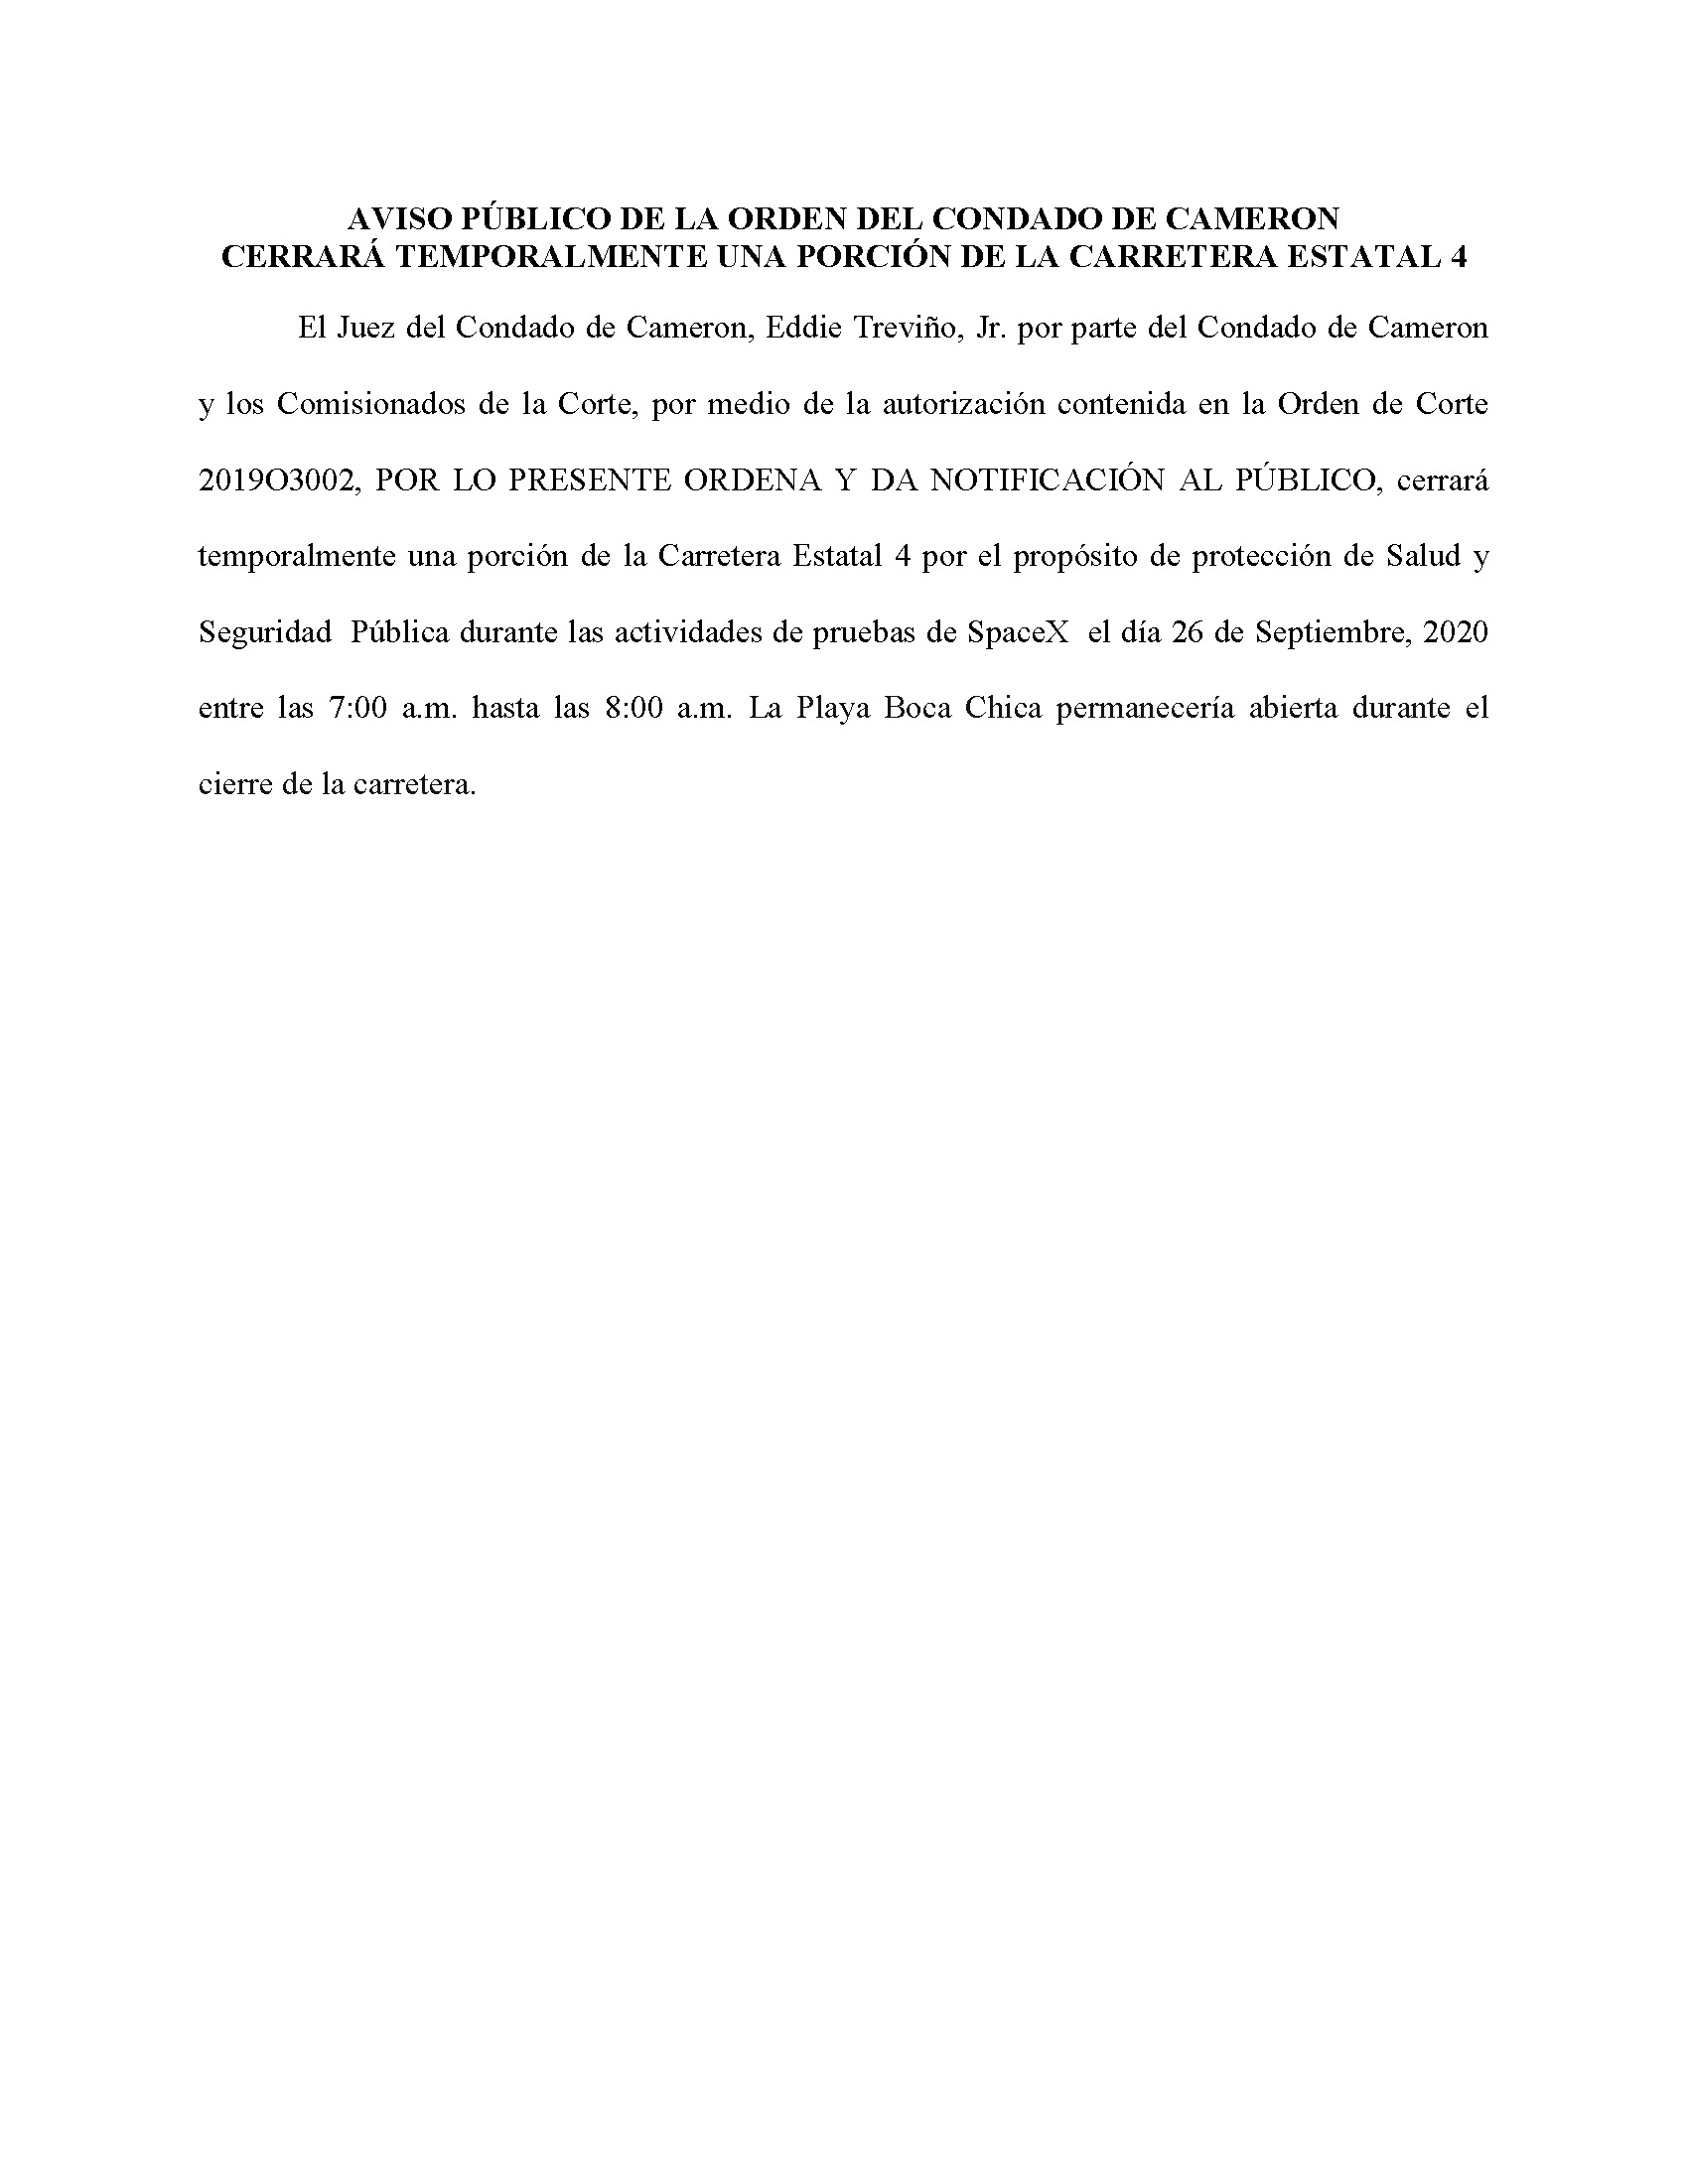 ORDER.CLOSURE OF HIGHWAY 4.SPANISH.09.26.20